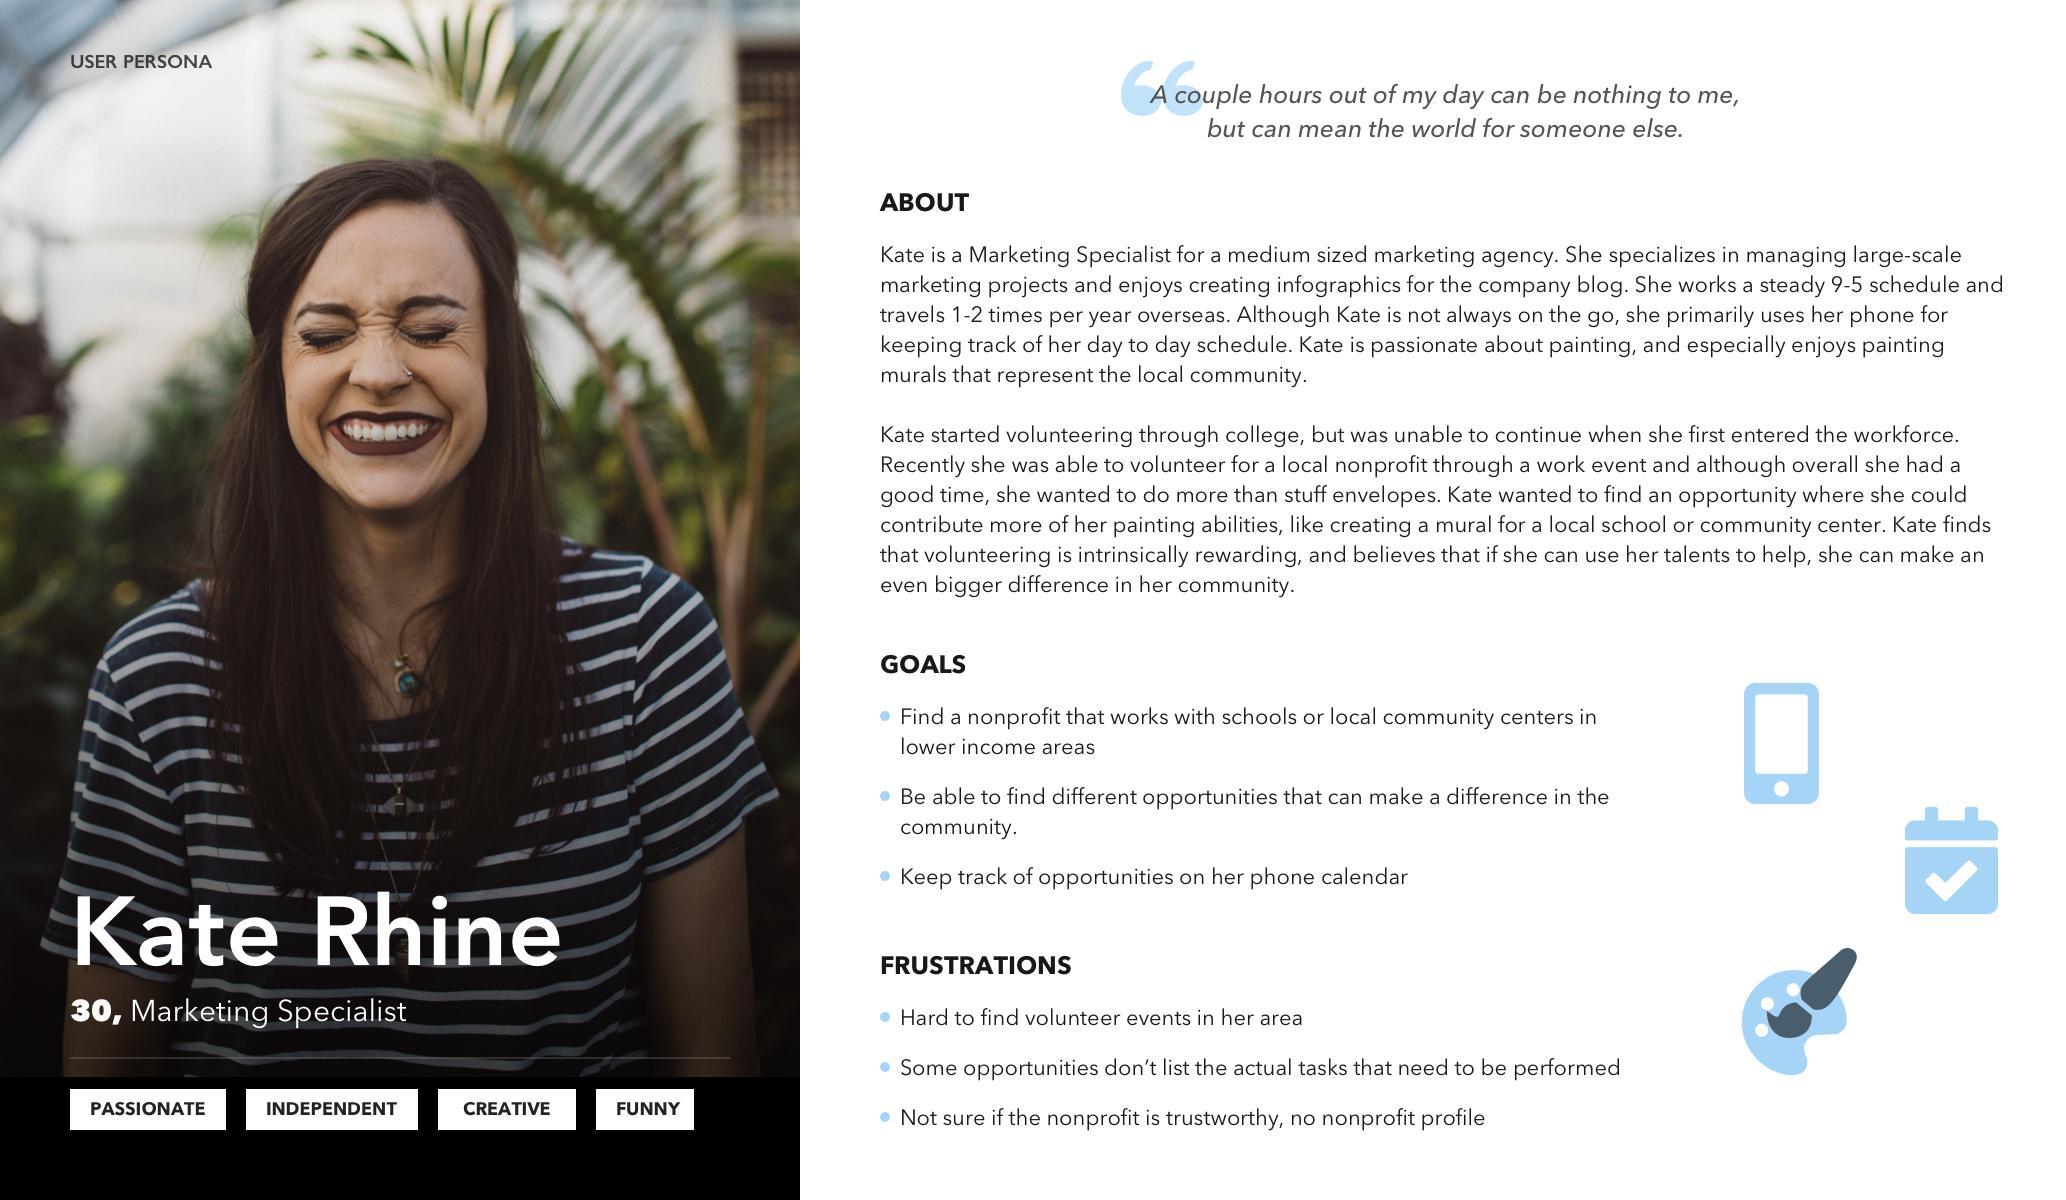 User Persona- Kate Rhine